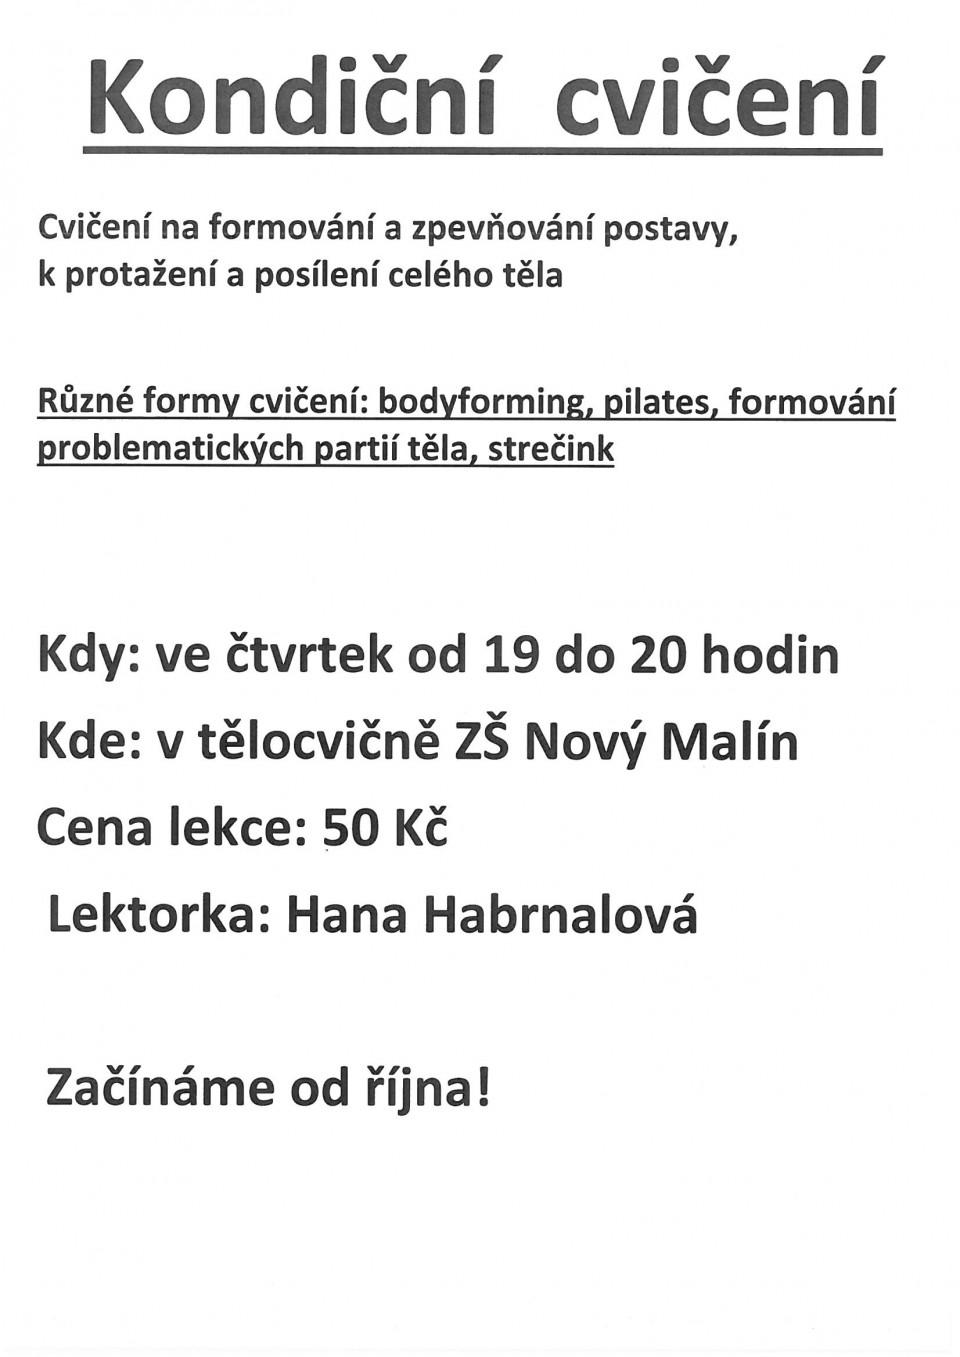 kondicni-cviceni-s-hankou-habrnalovou